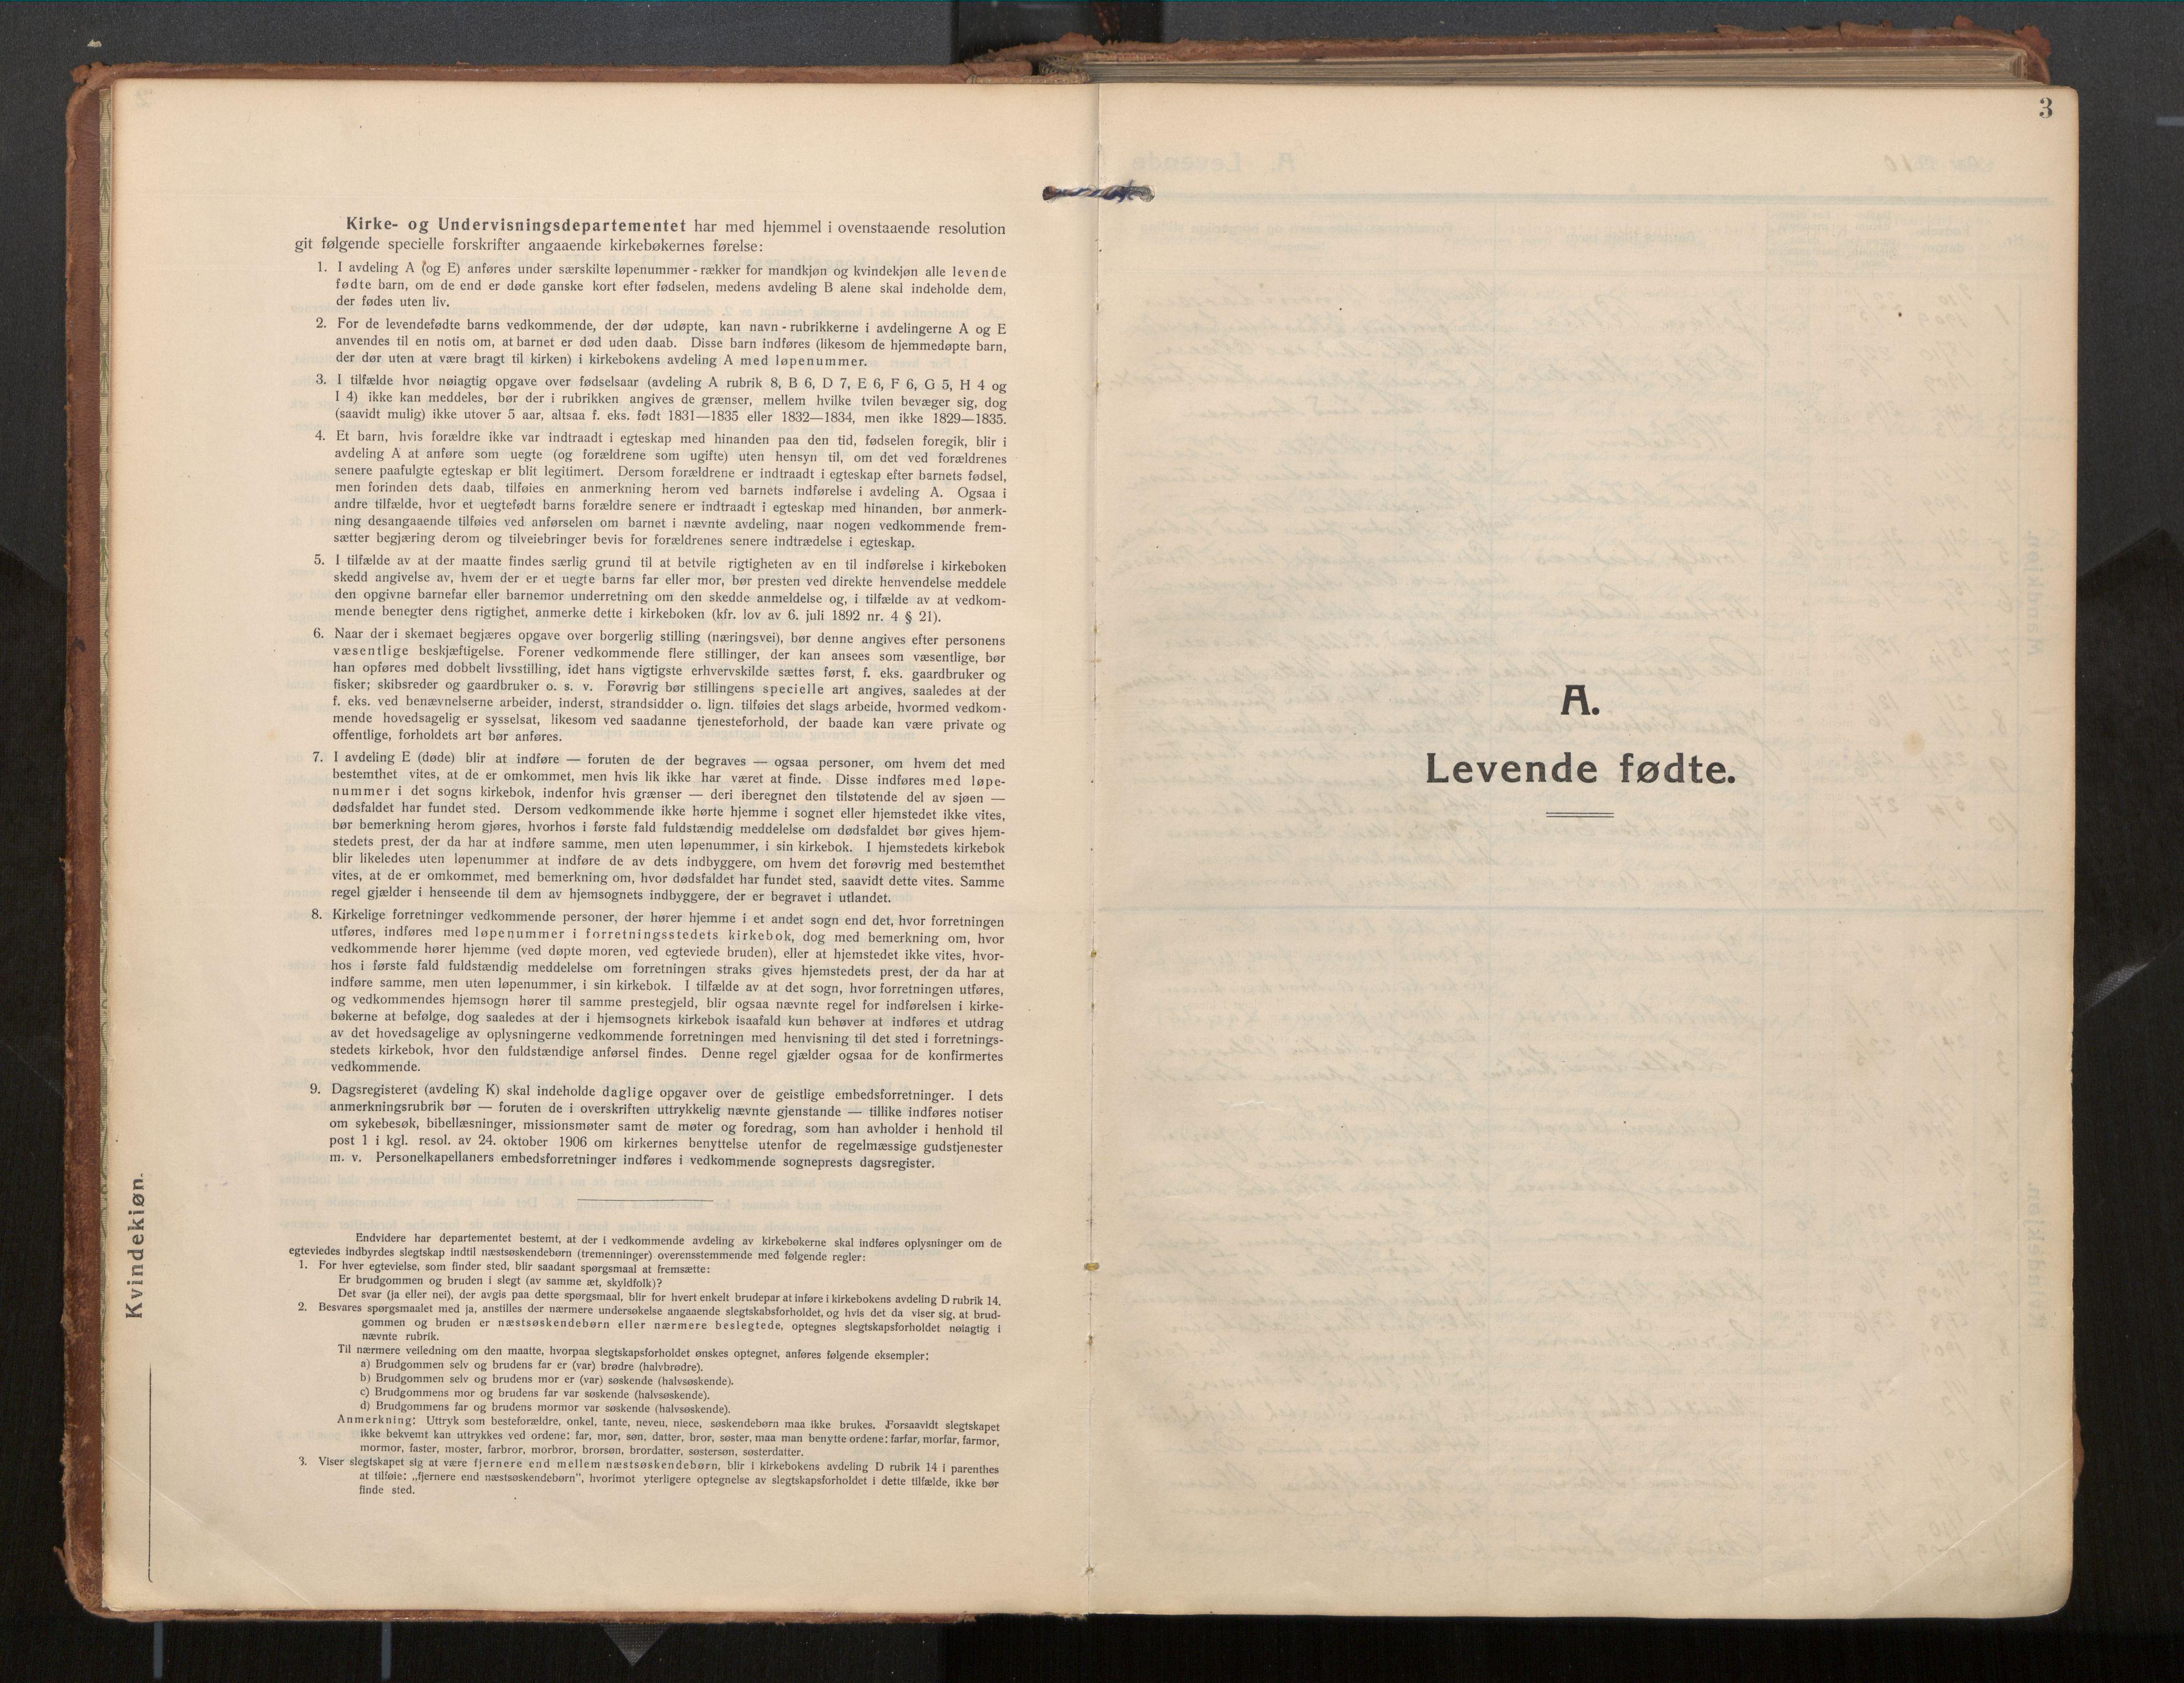 SAT, Ministerialprotokoller, klokkerbøker og fødselsregistre - Nordland, 854/L0784: Ministerialbok nr. 854A07, 1910-1922, s. 3